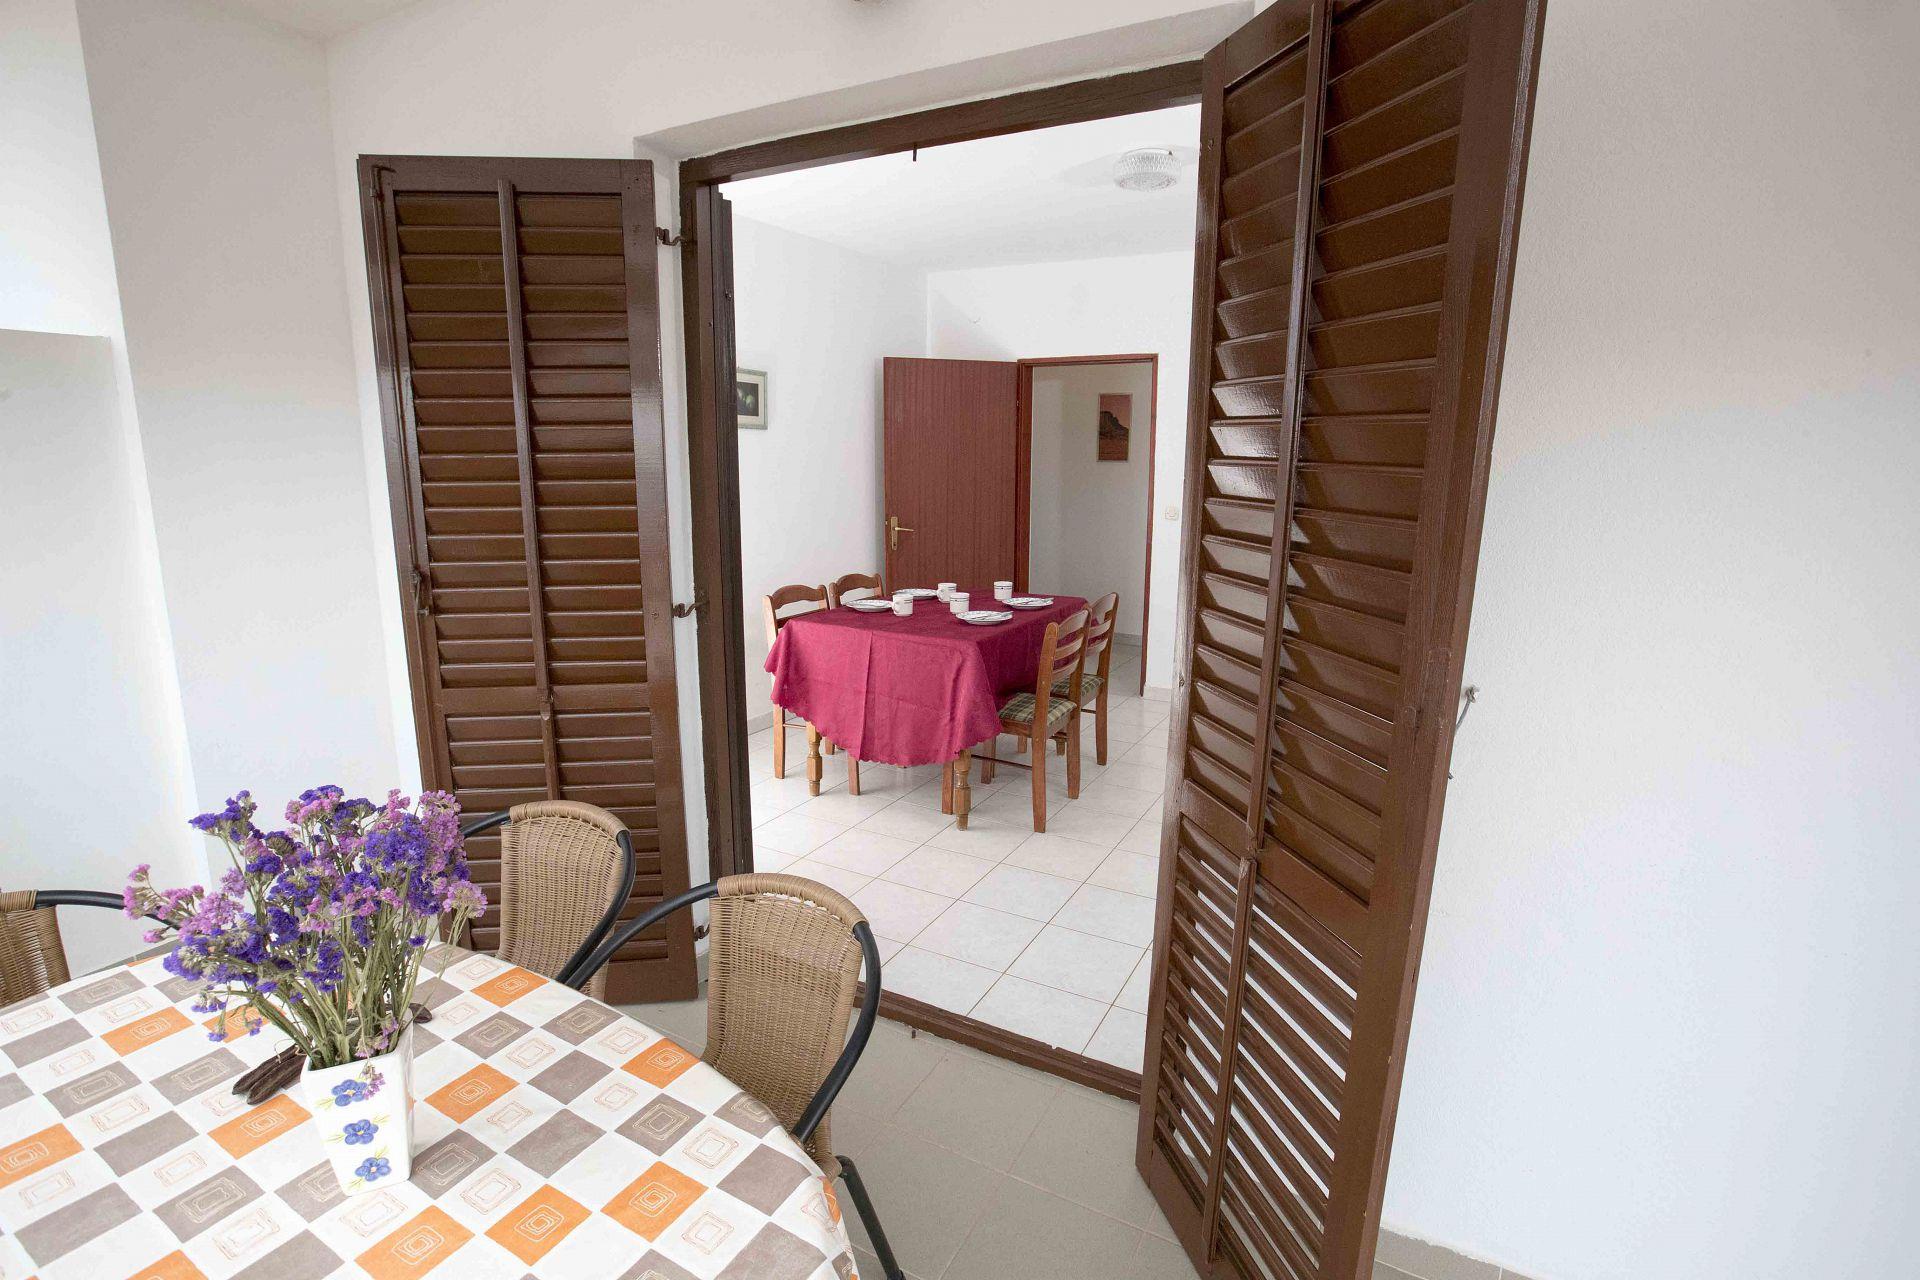 00603ZAVA - Zavala - Appartementen Kroatië - Tonia(4+1): terras